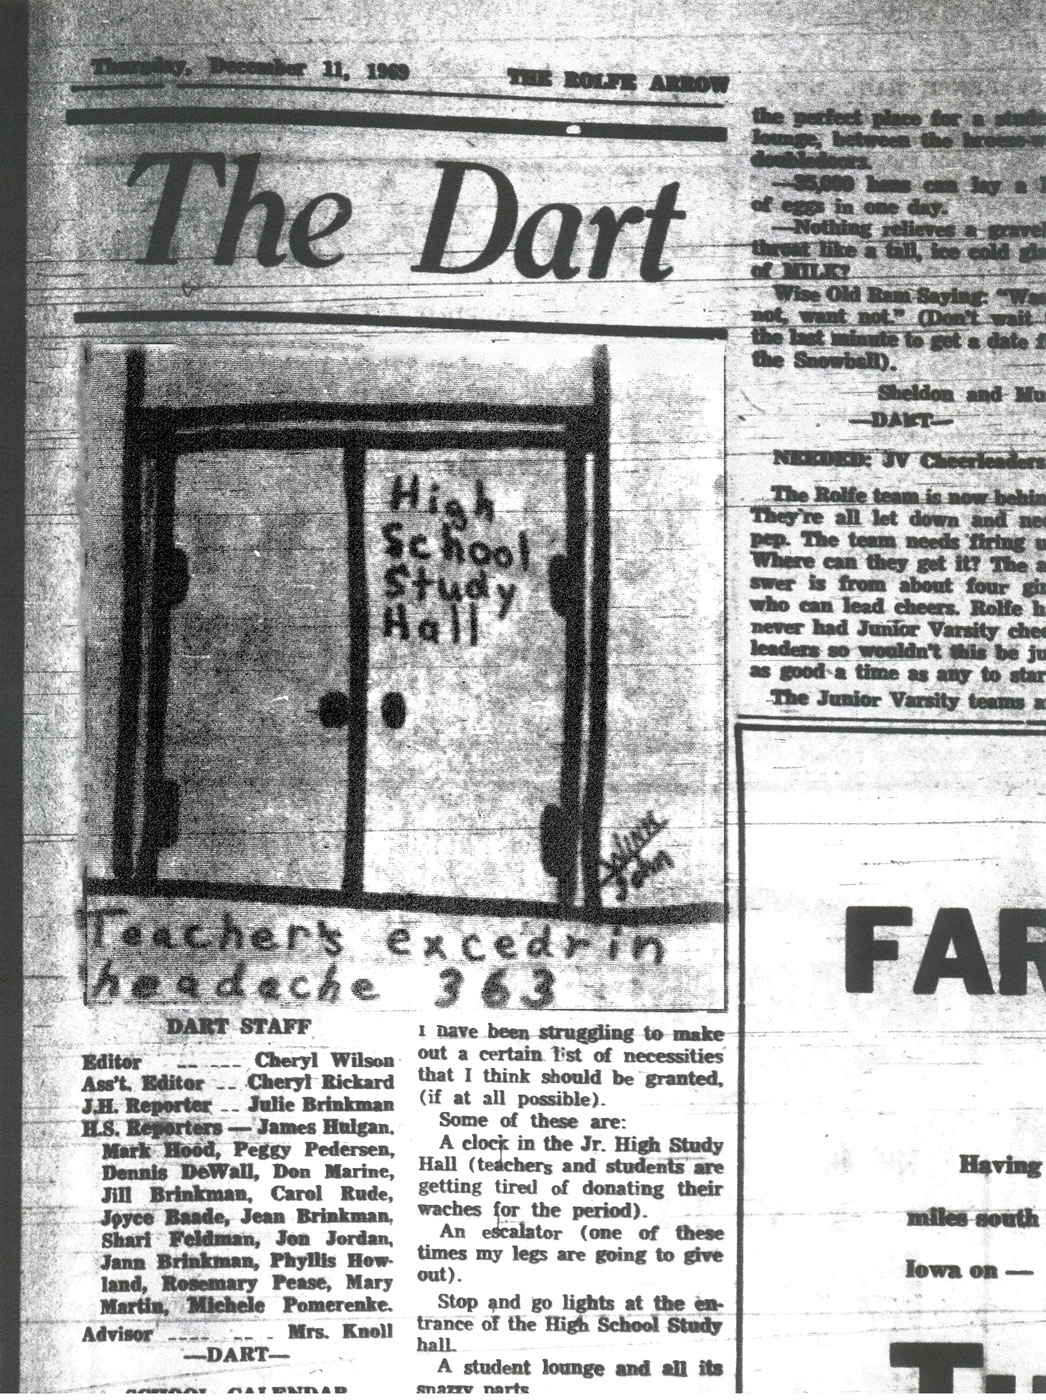 Dart Dec 11 1969 light and dark levels past 1400